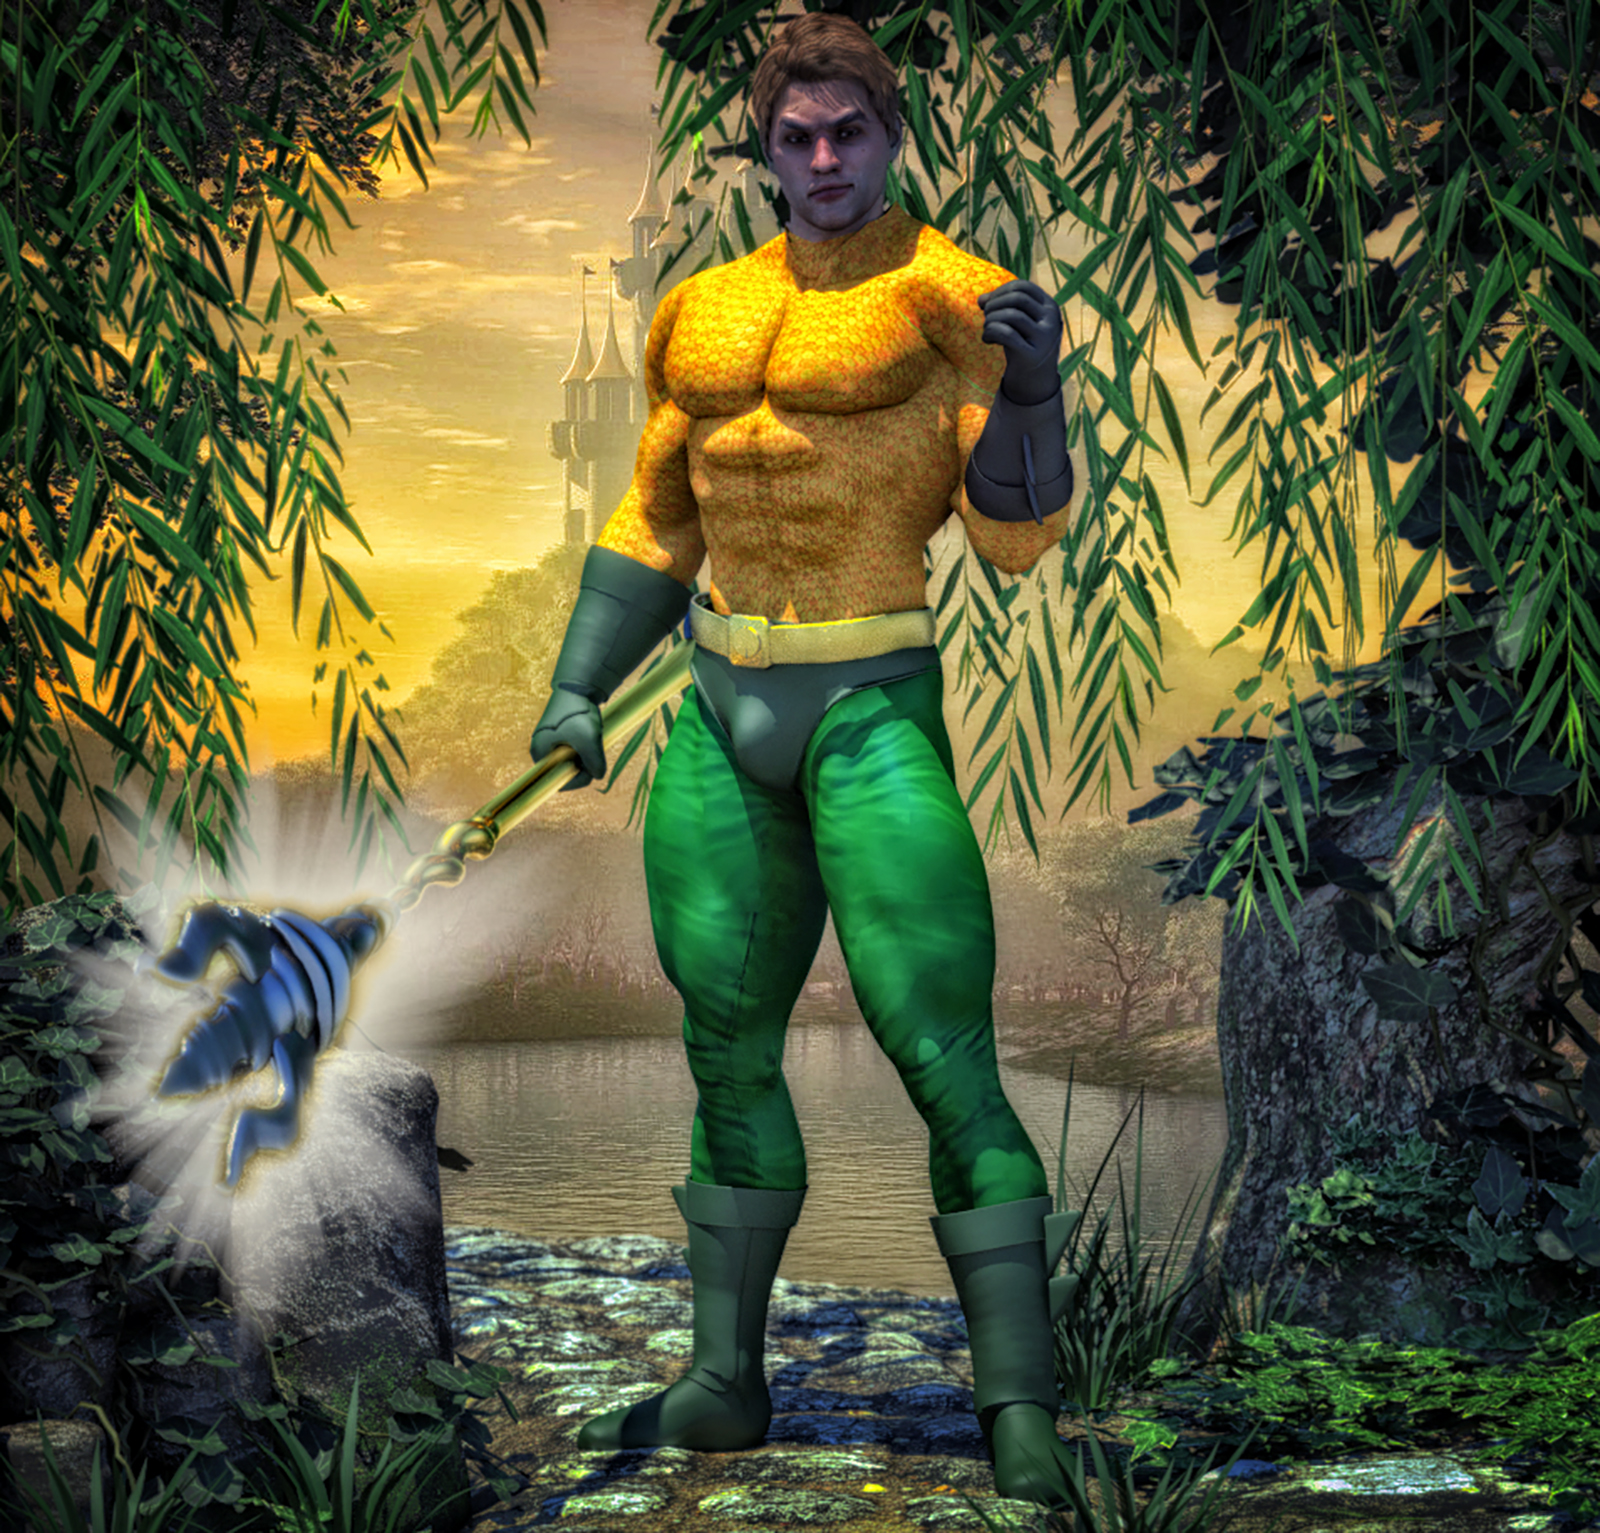 Aquaman classic second skin textures x M4 by hiram67